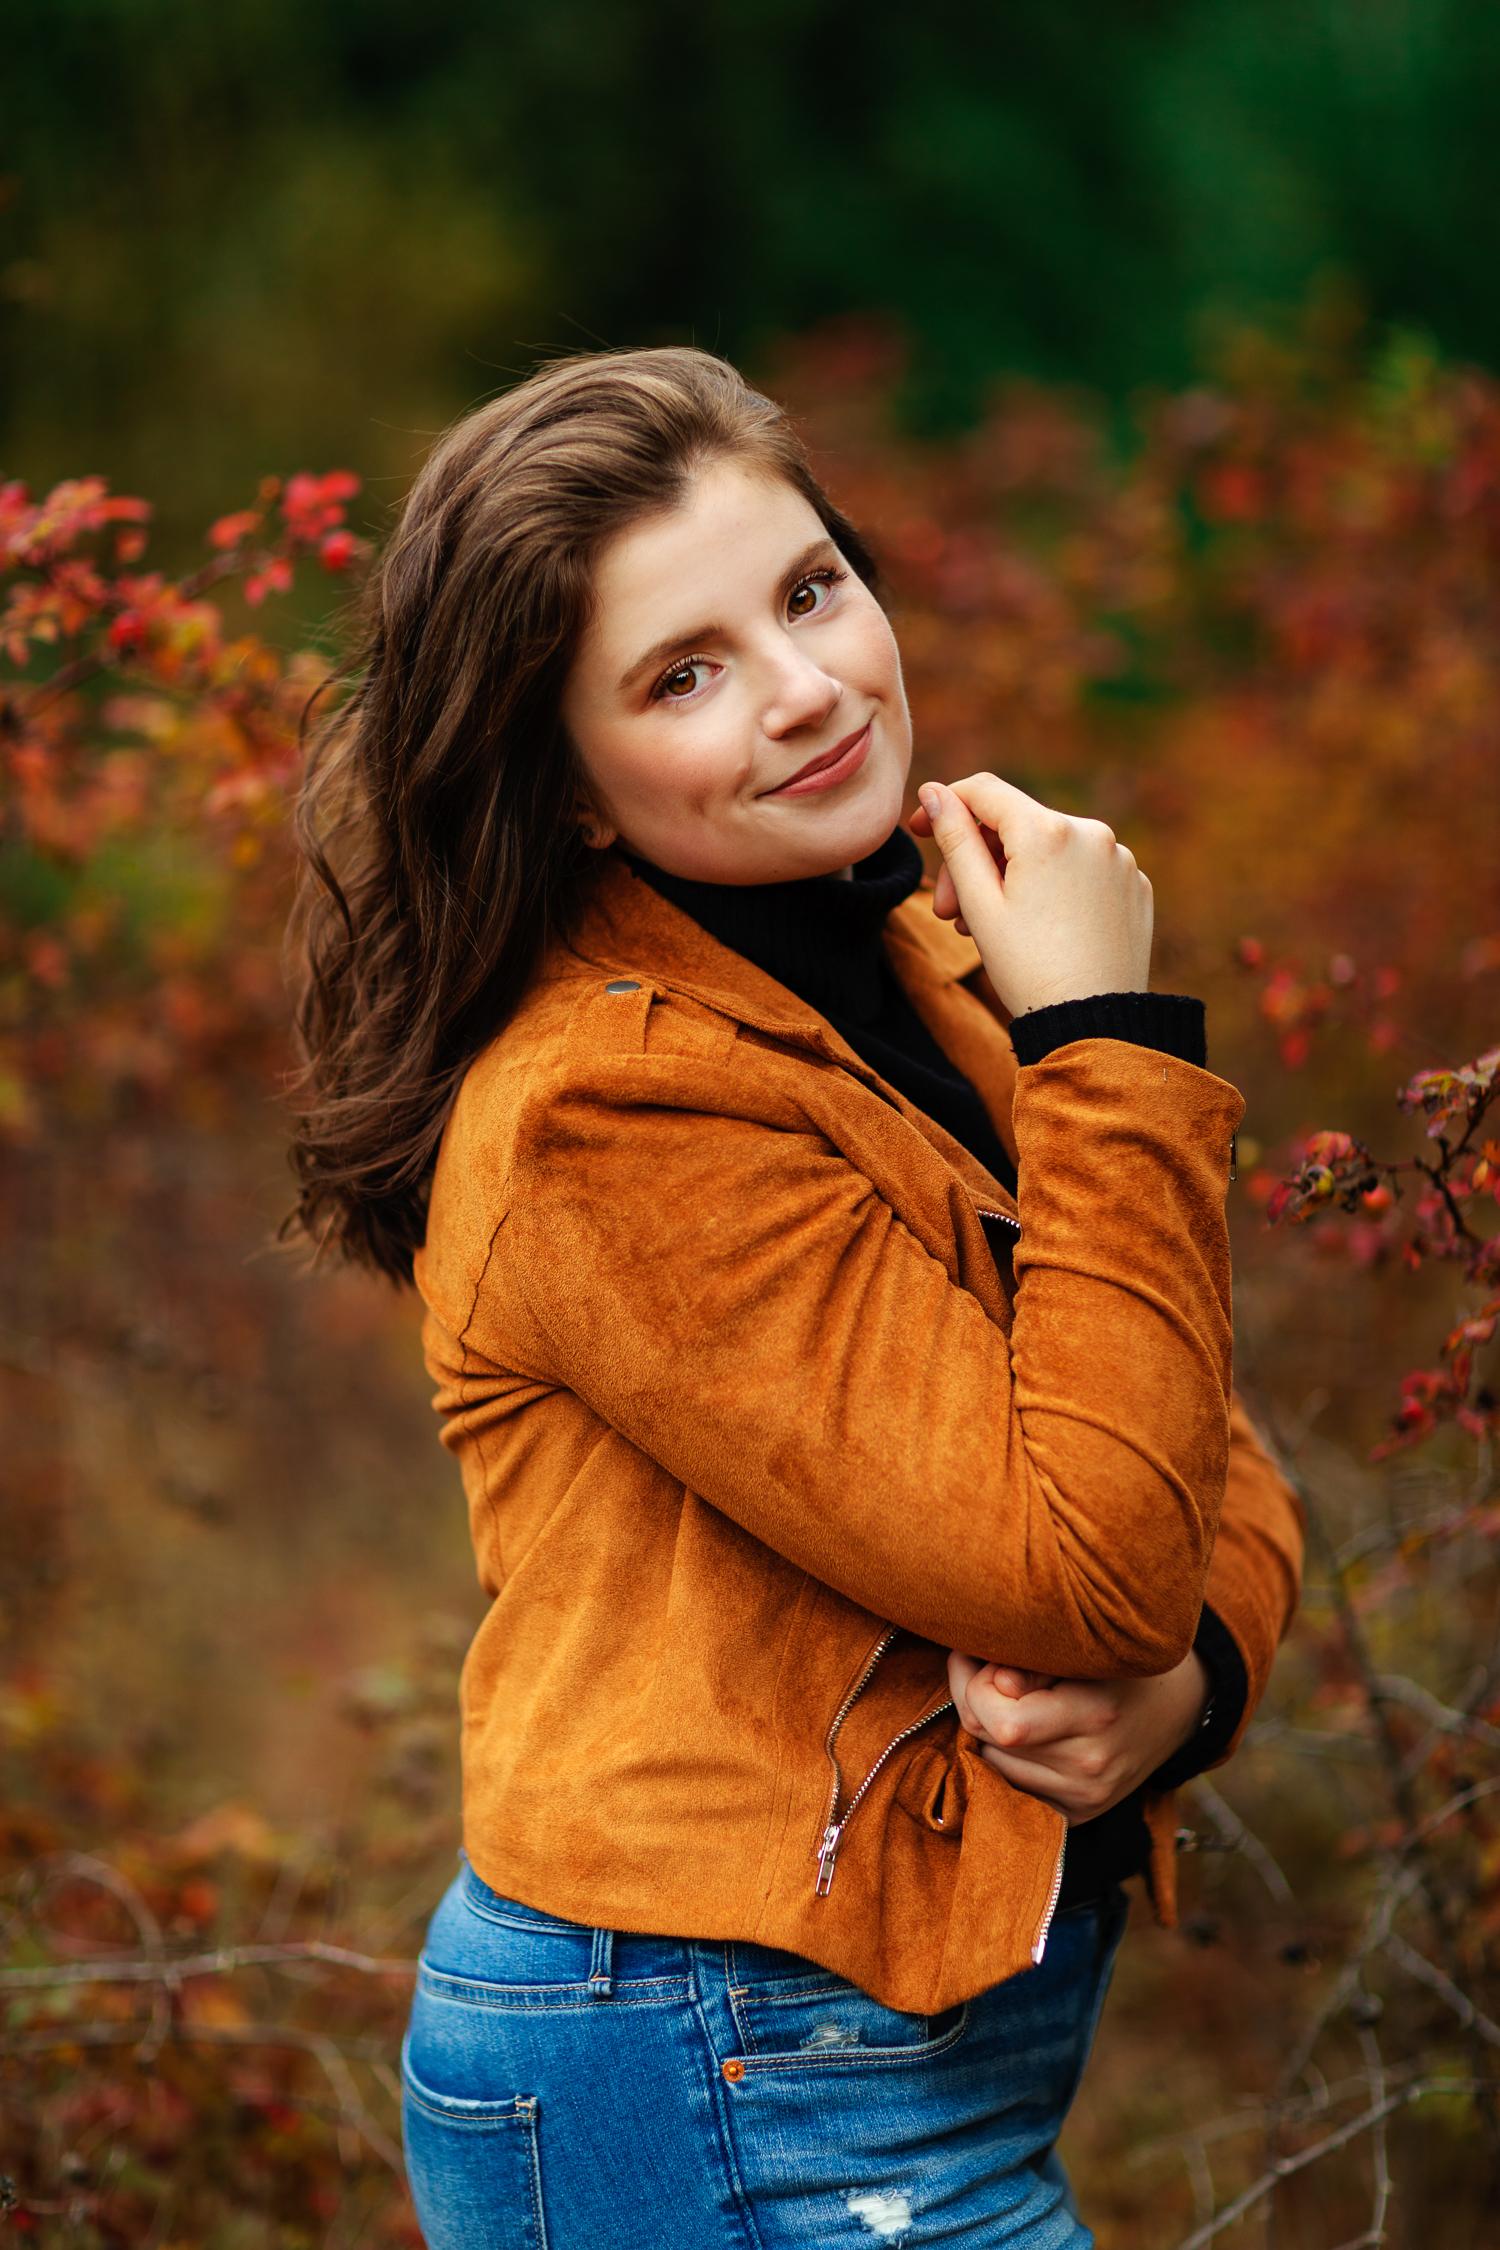 ariellanoellephotography-overlake-high-school-senior-portraits-top-seattle-area-highschool-senior-photographer-1-2.jpg